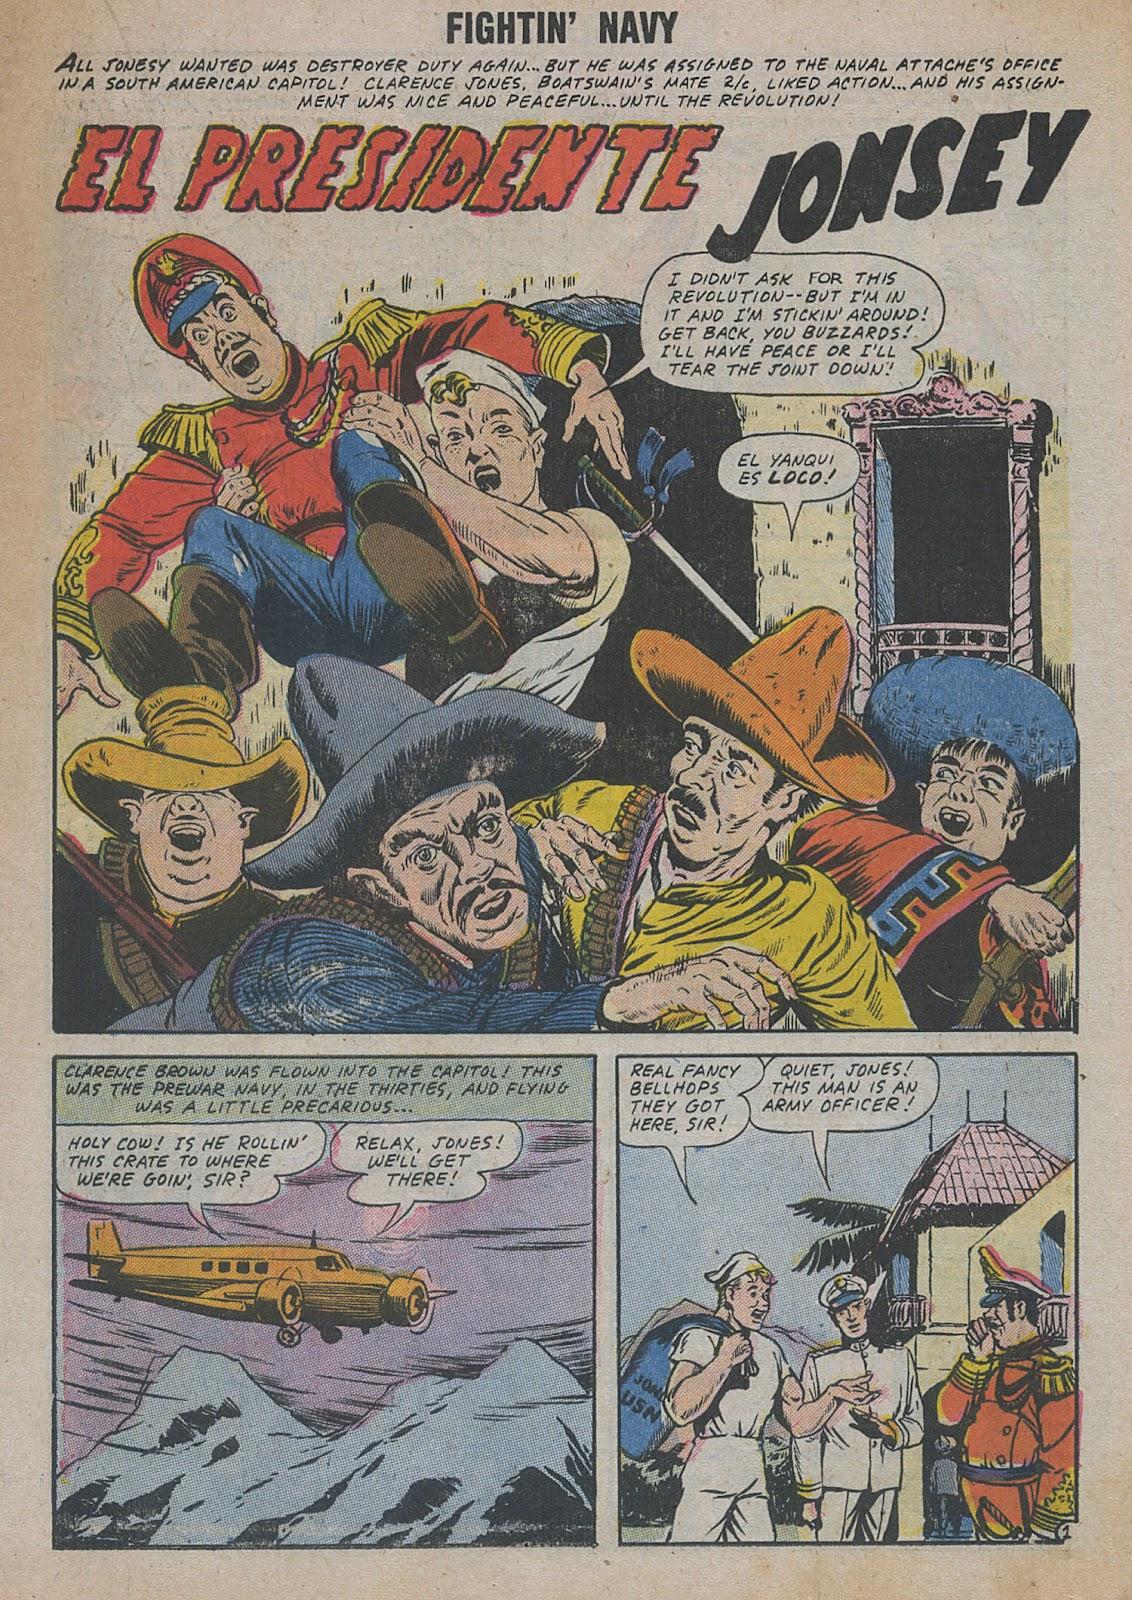 Read online Fightin' Navy comic -  Issue #82 - 29